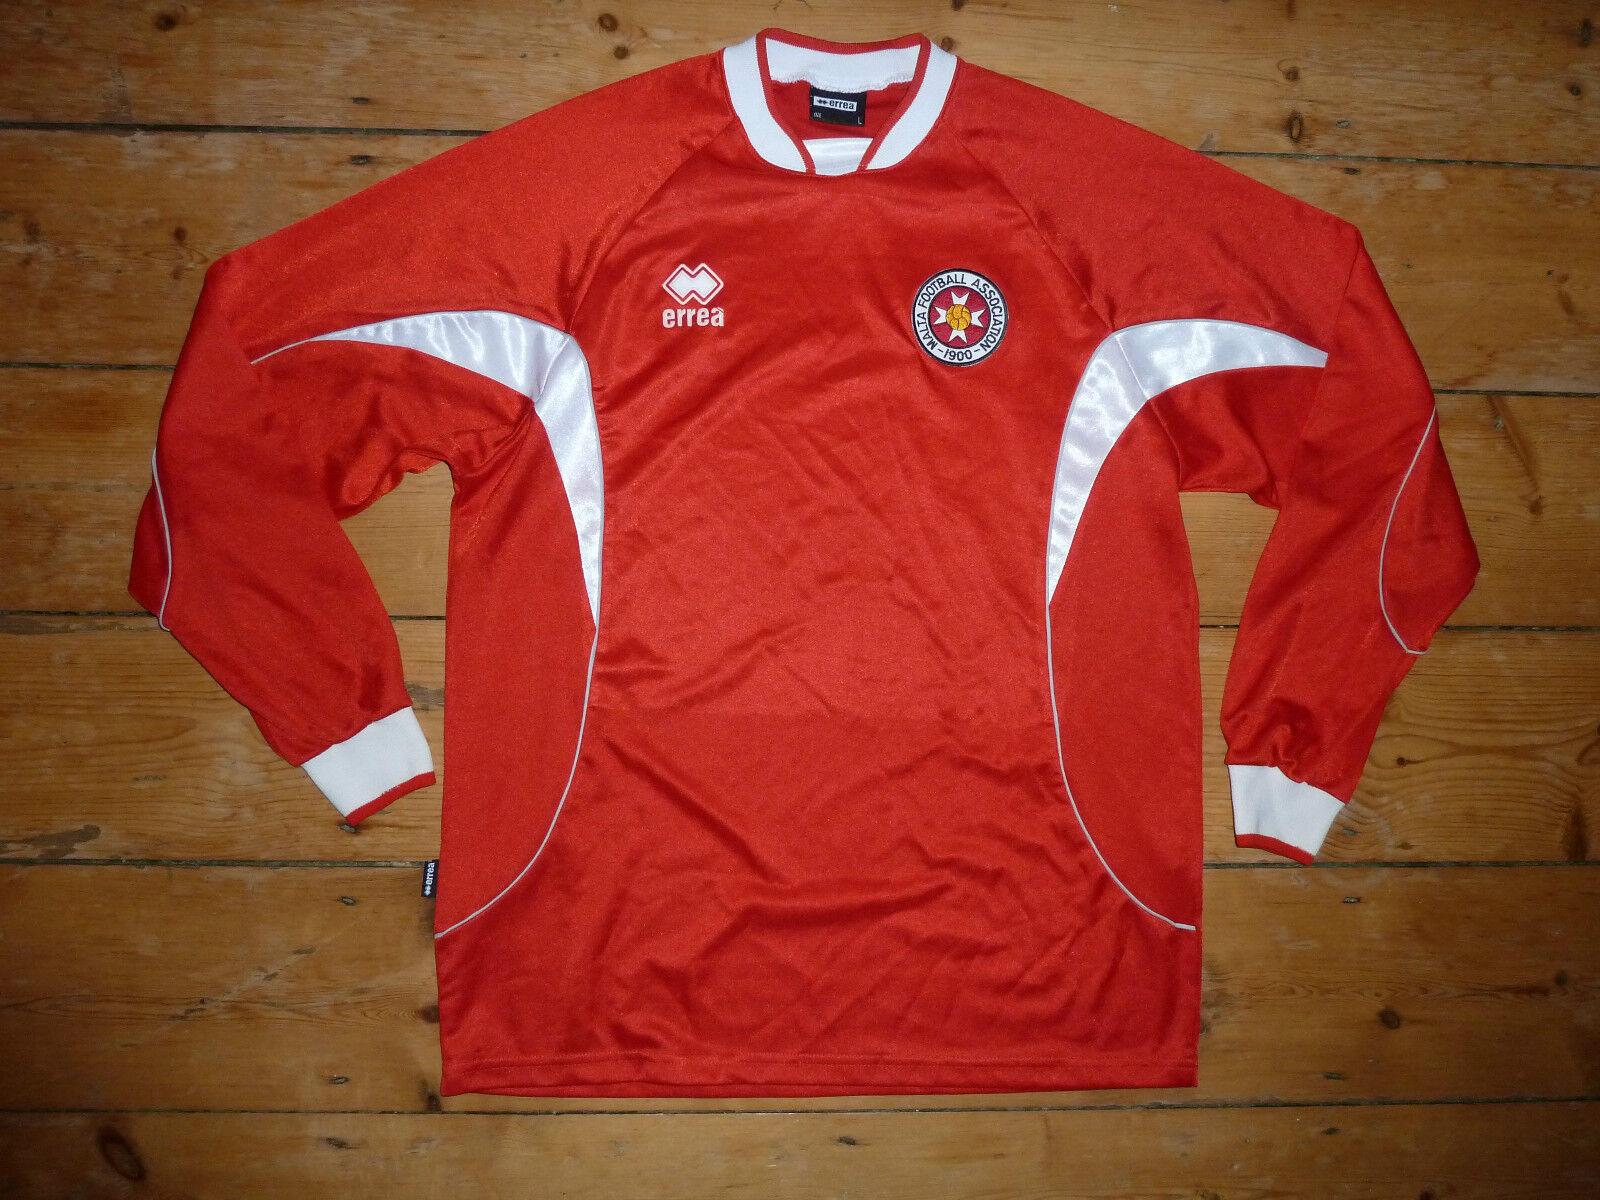 Malta Maillot de Foot Grand Rétro Maglia Tee-Shirt Tricot Football Chemise Malte